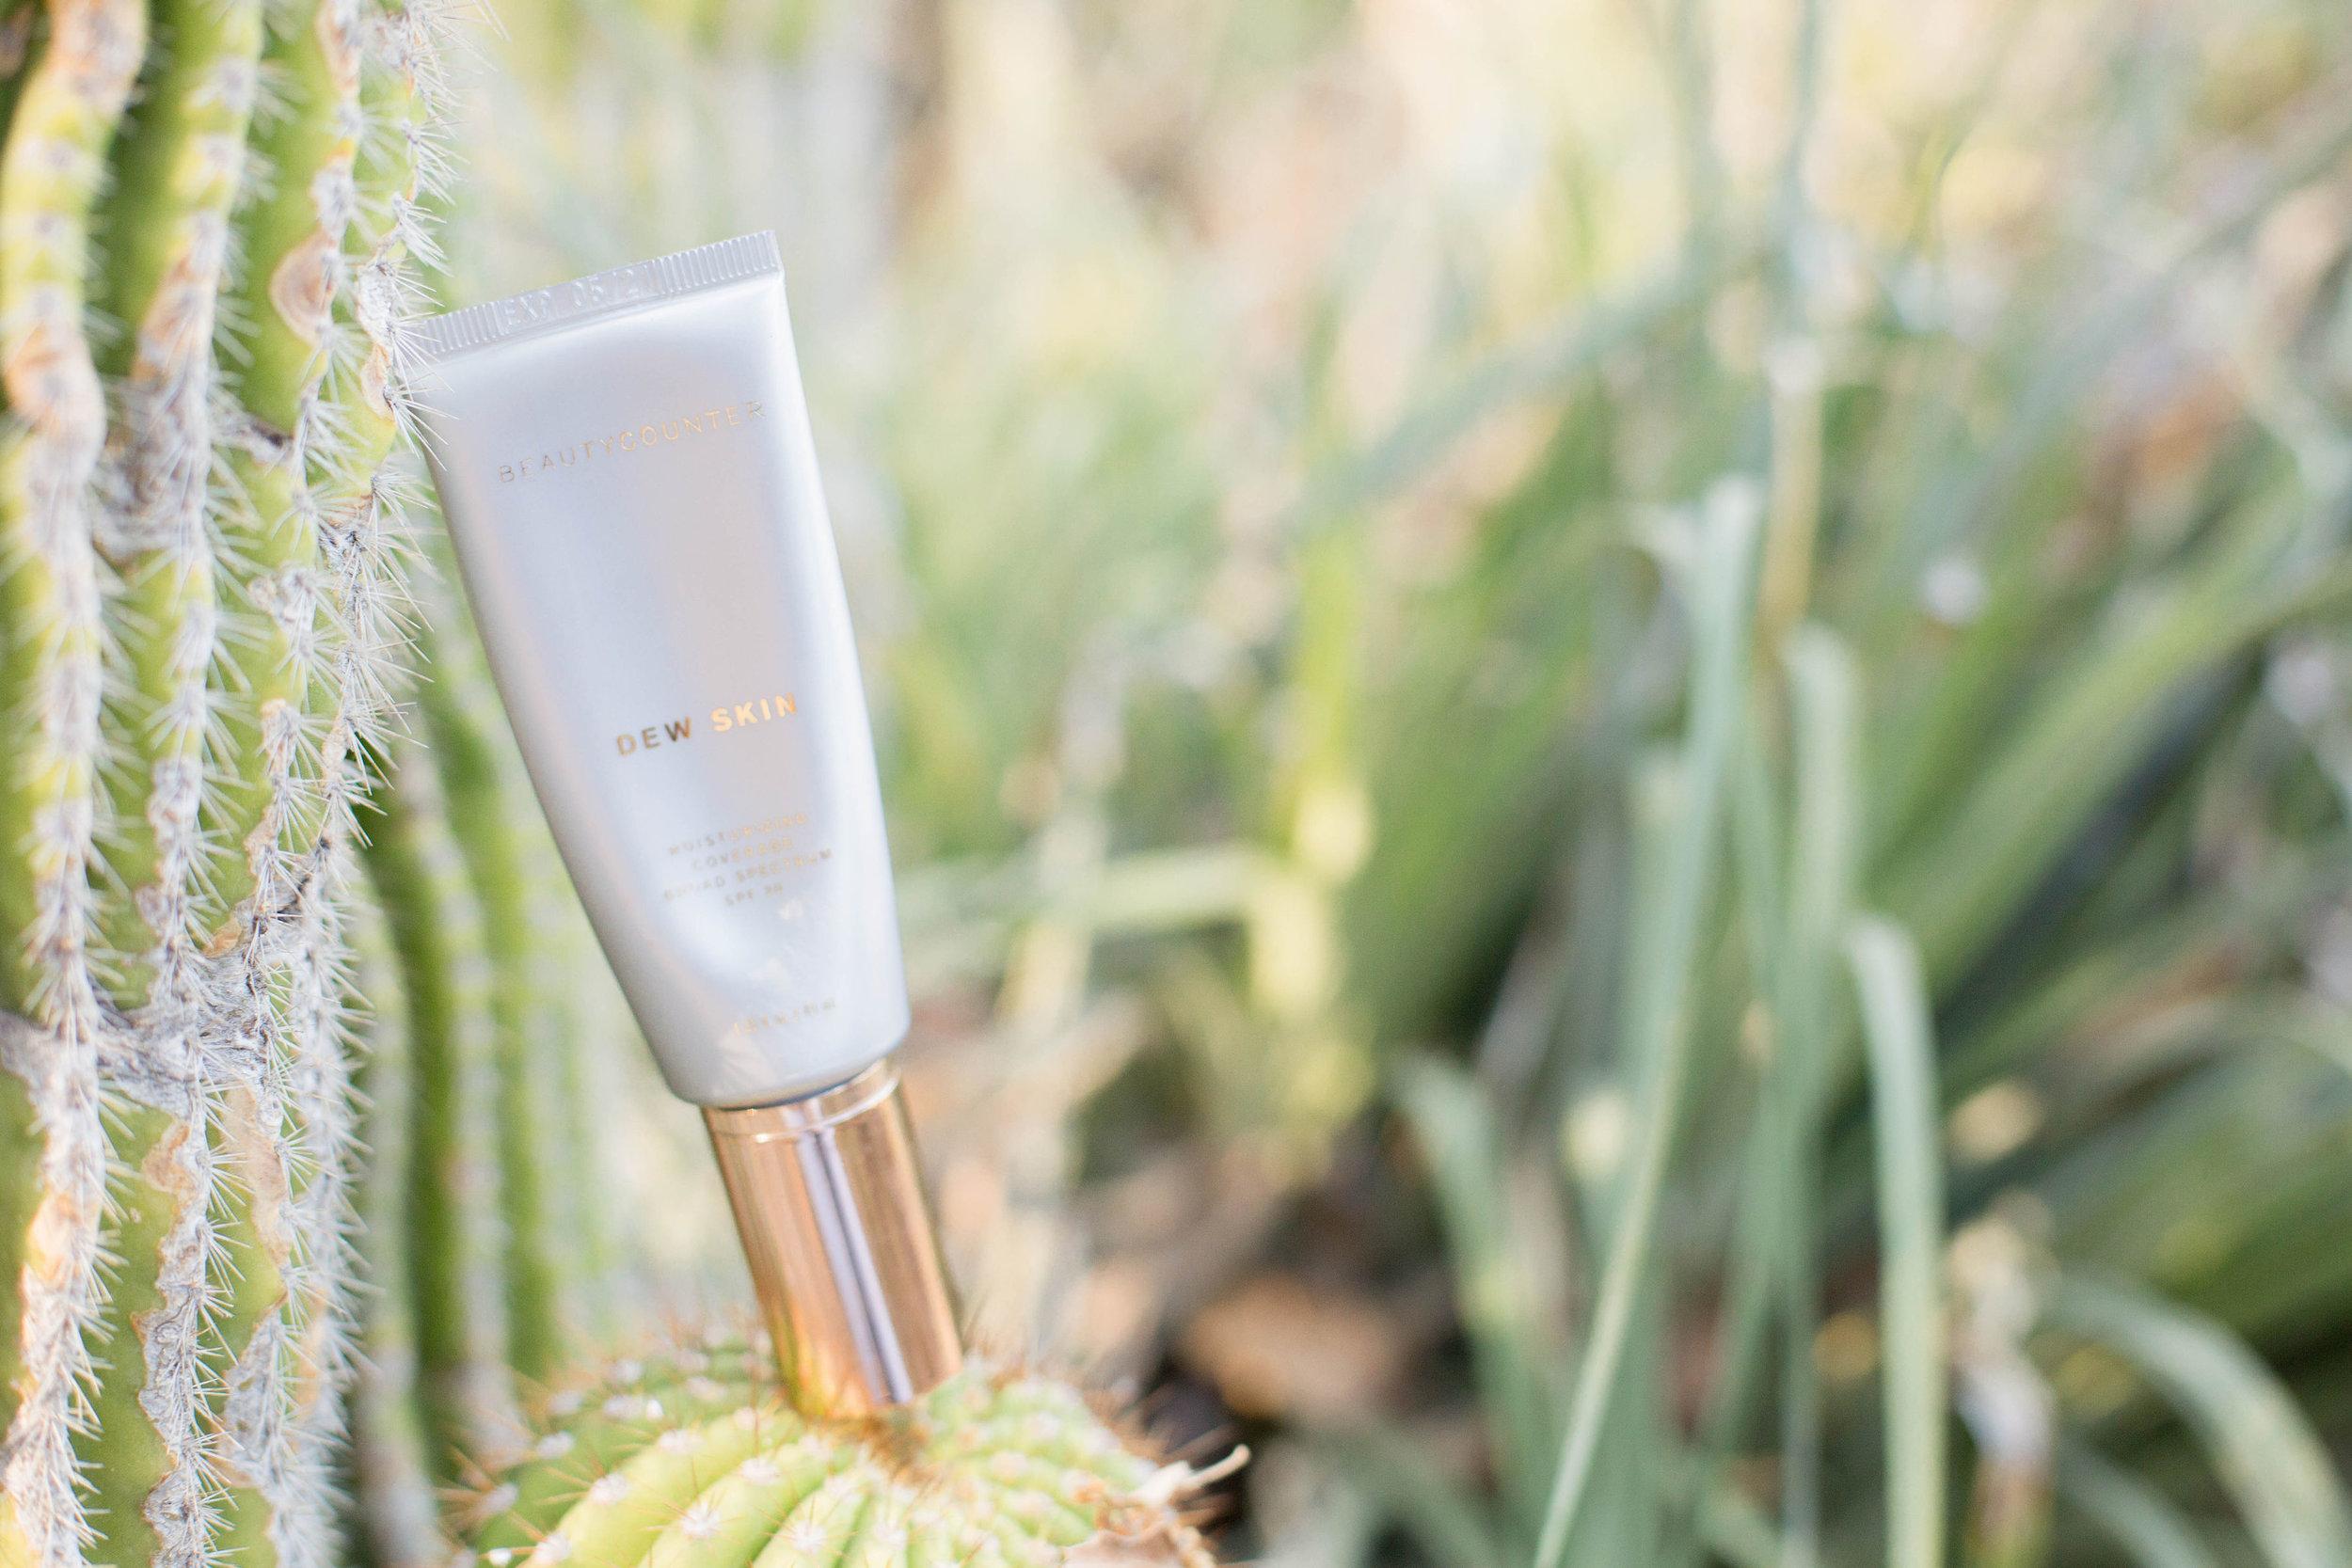 dew-skin-favorite-products-cassandra-mcclure